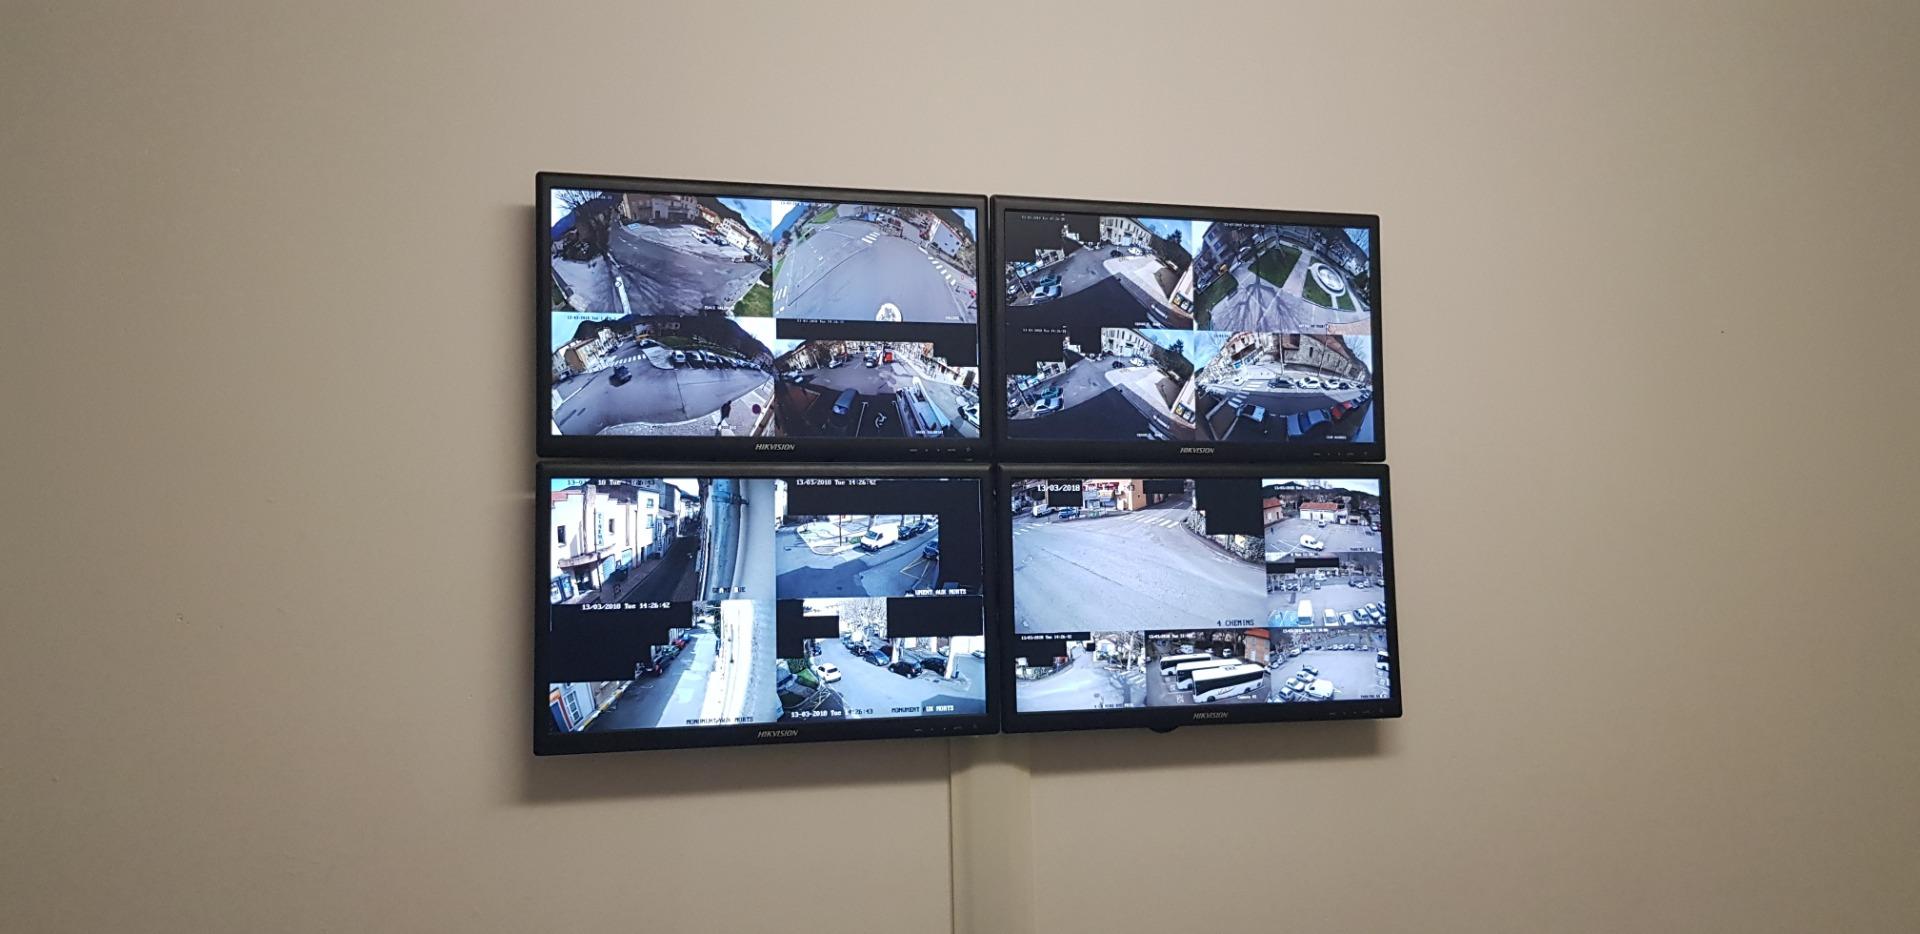 Ecrans surveillance caméra